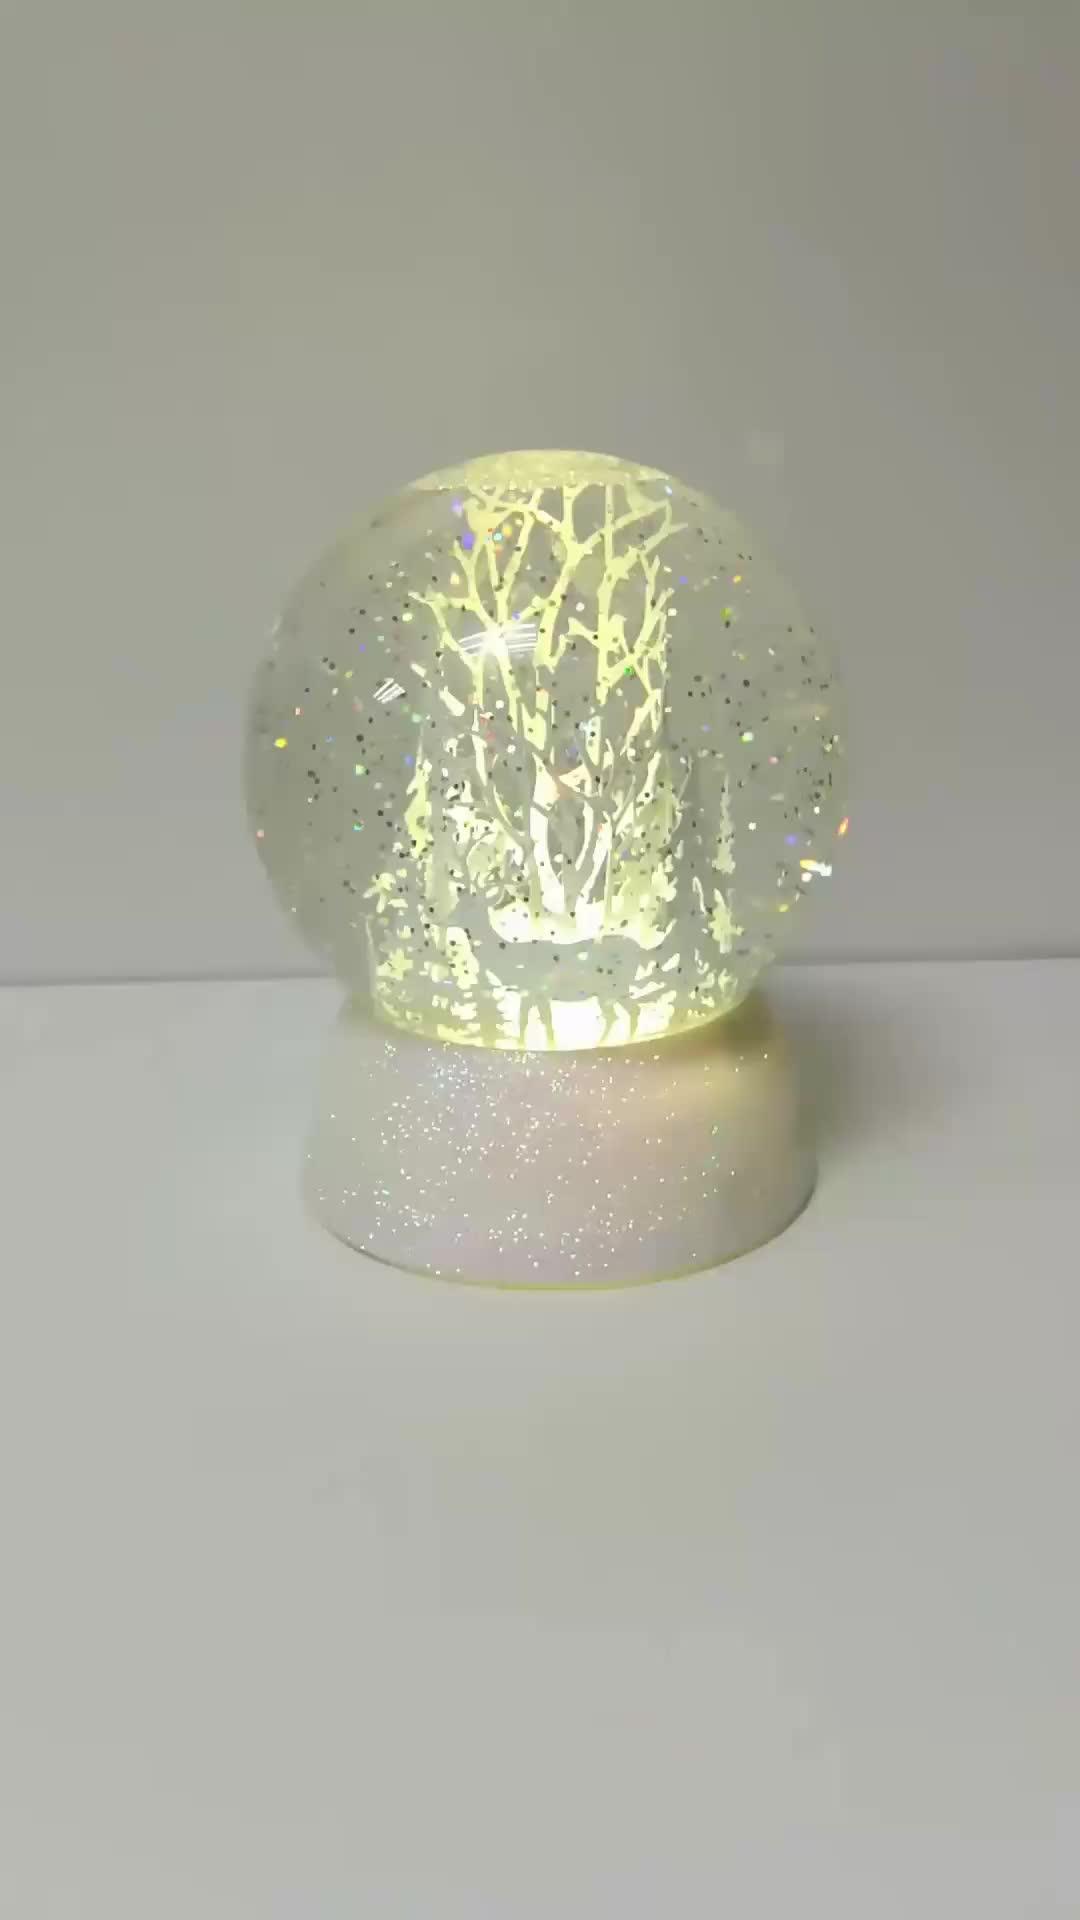 Christmas globe deer decor decorative plastic acrylic lighted snow globe